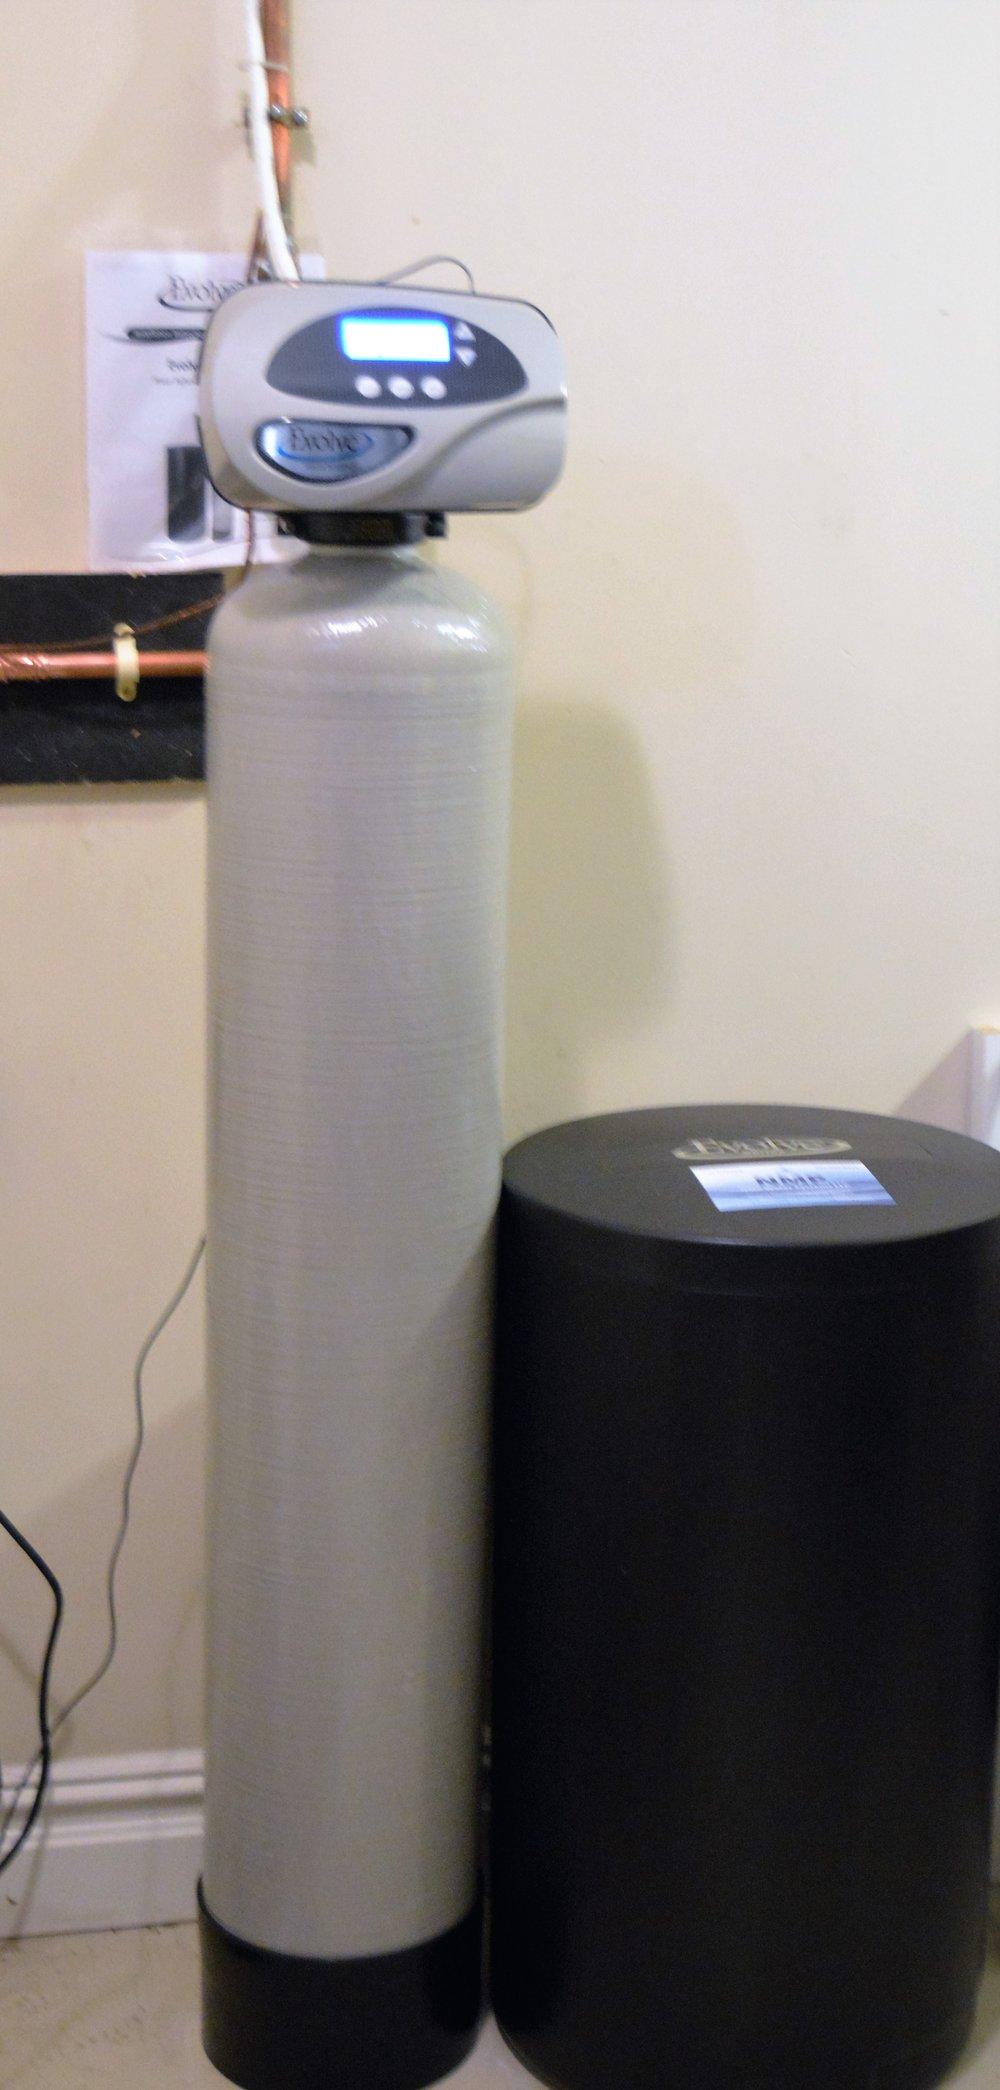 Water Softener with Filtration Ridgewood, NJ.JPG